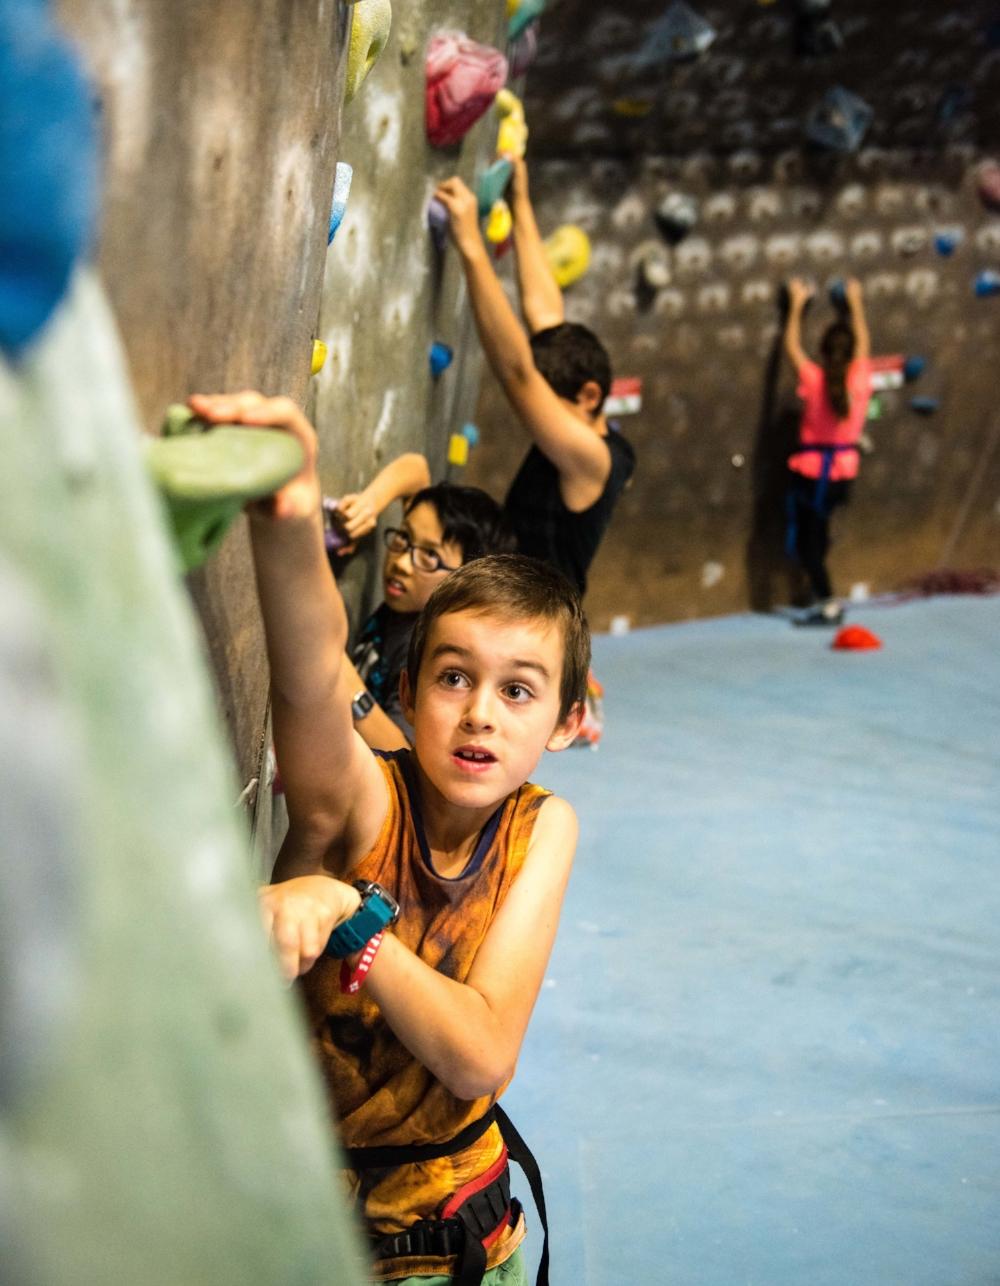 climbfit_sydney_boy_climbing_bouldering